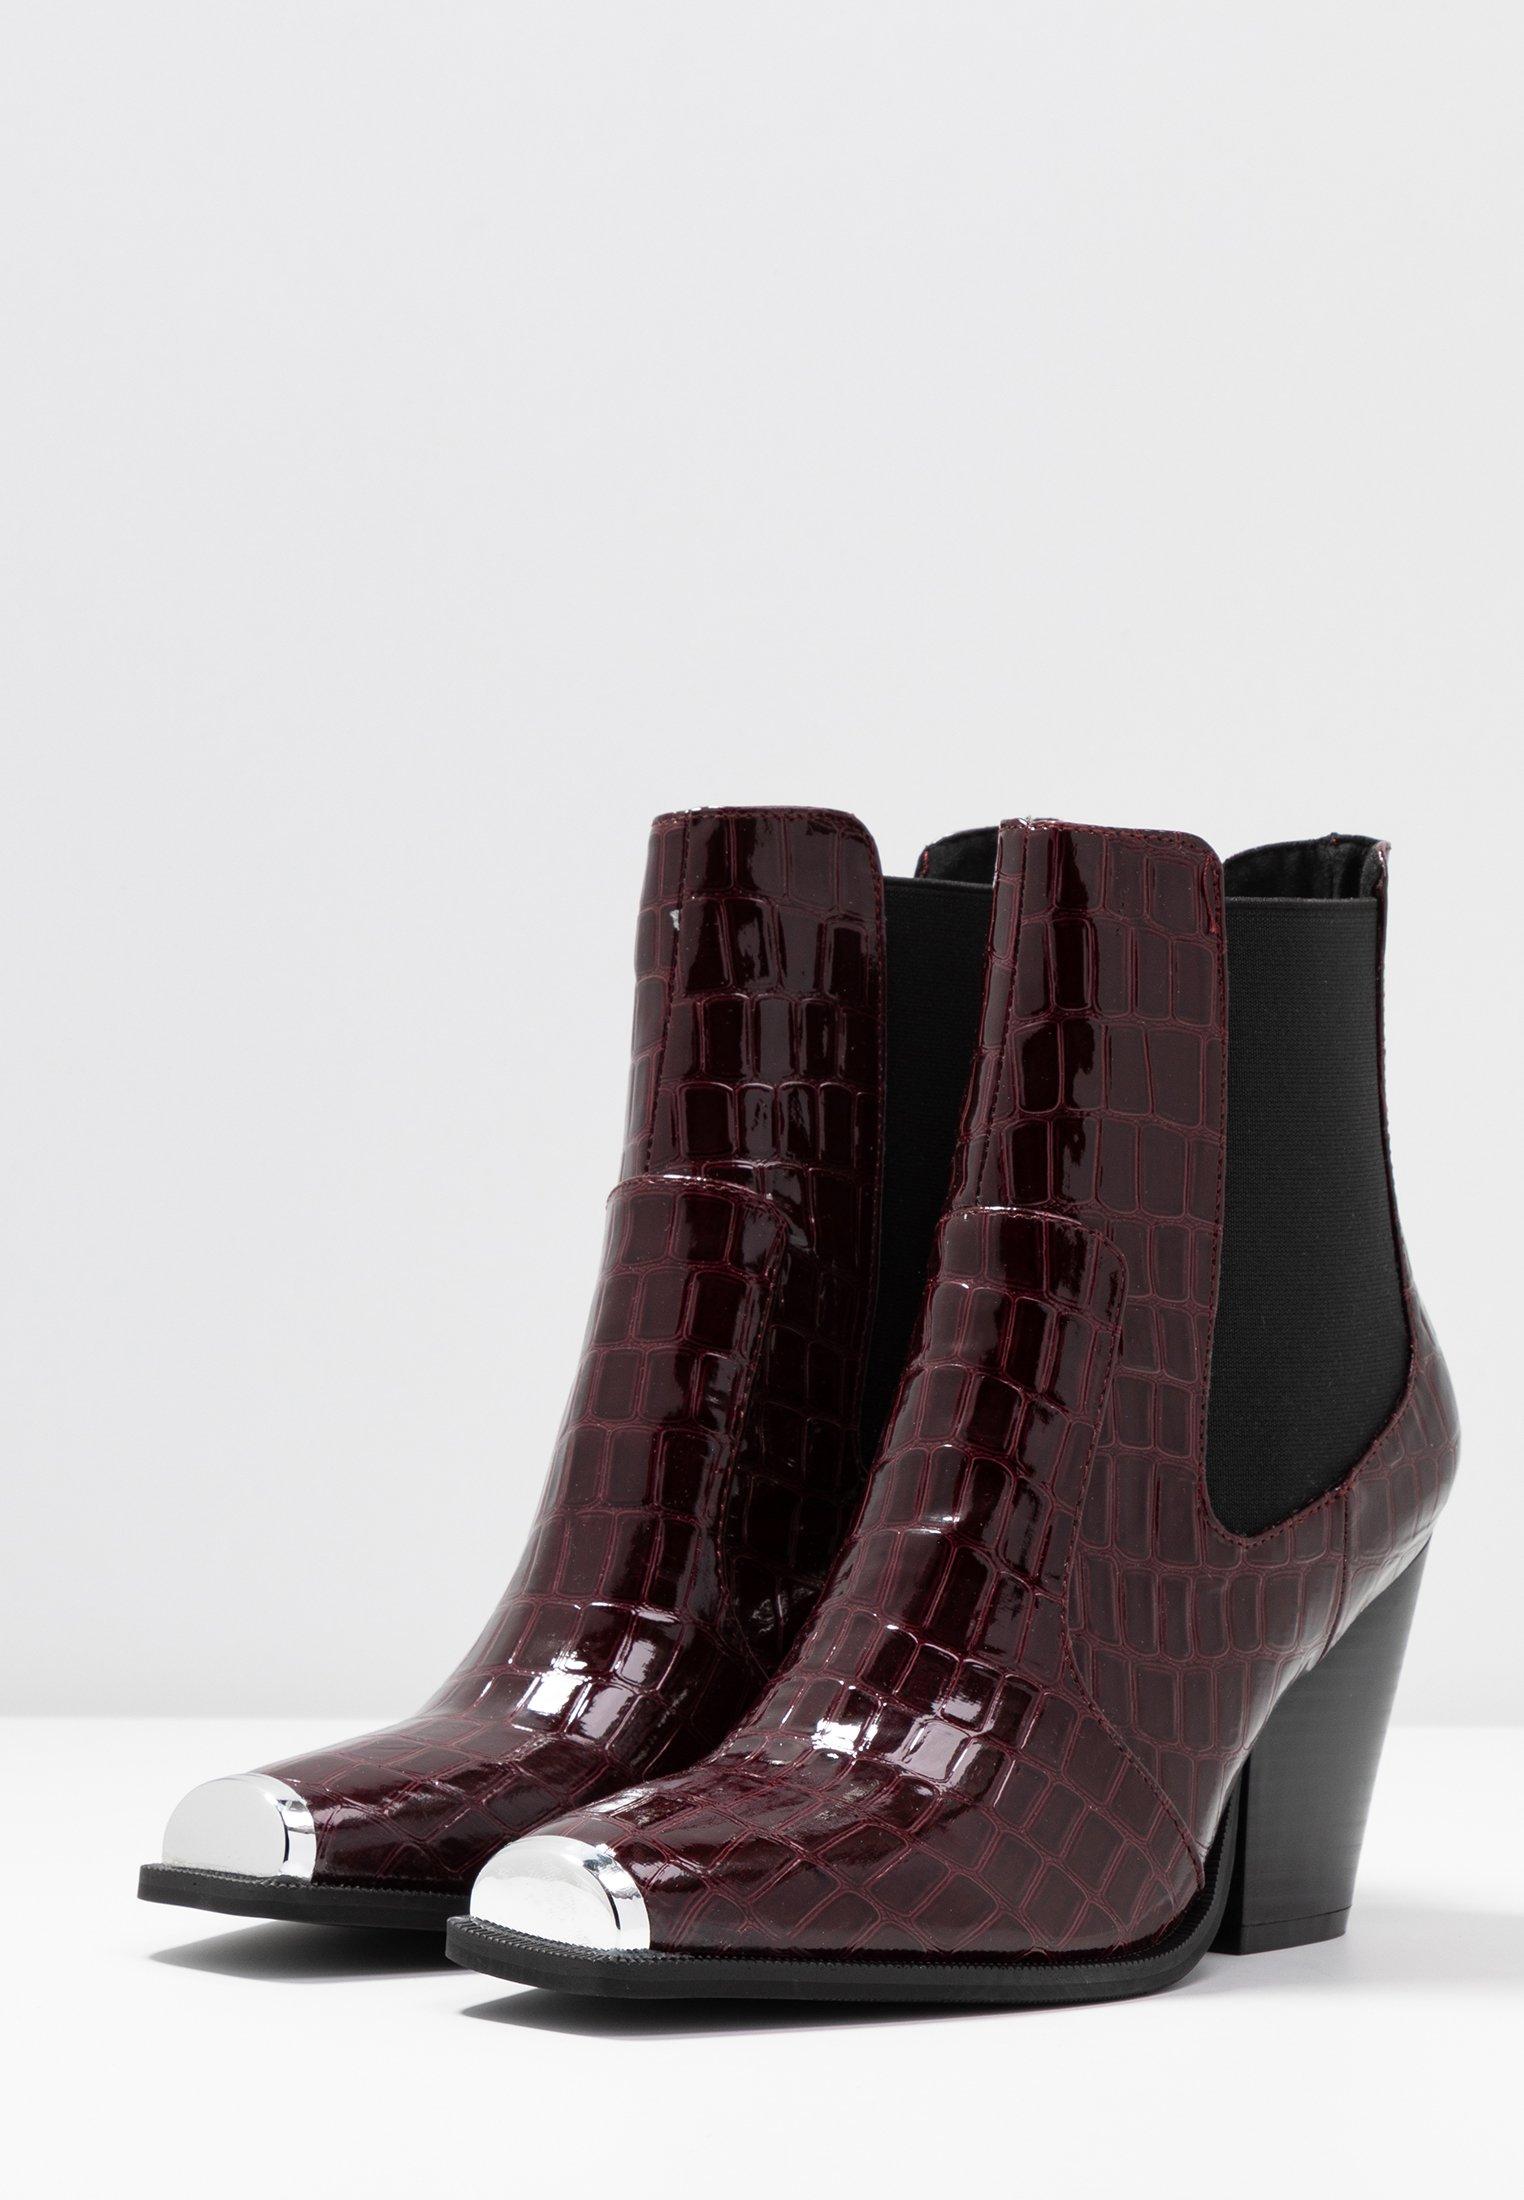 Dorothy Perkins LOLA SKYE LUCA SQUARE TOE WESTERN - Ankelboots med høye hæler - burgundy